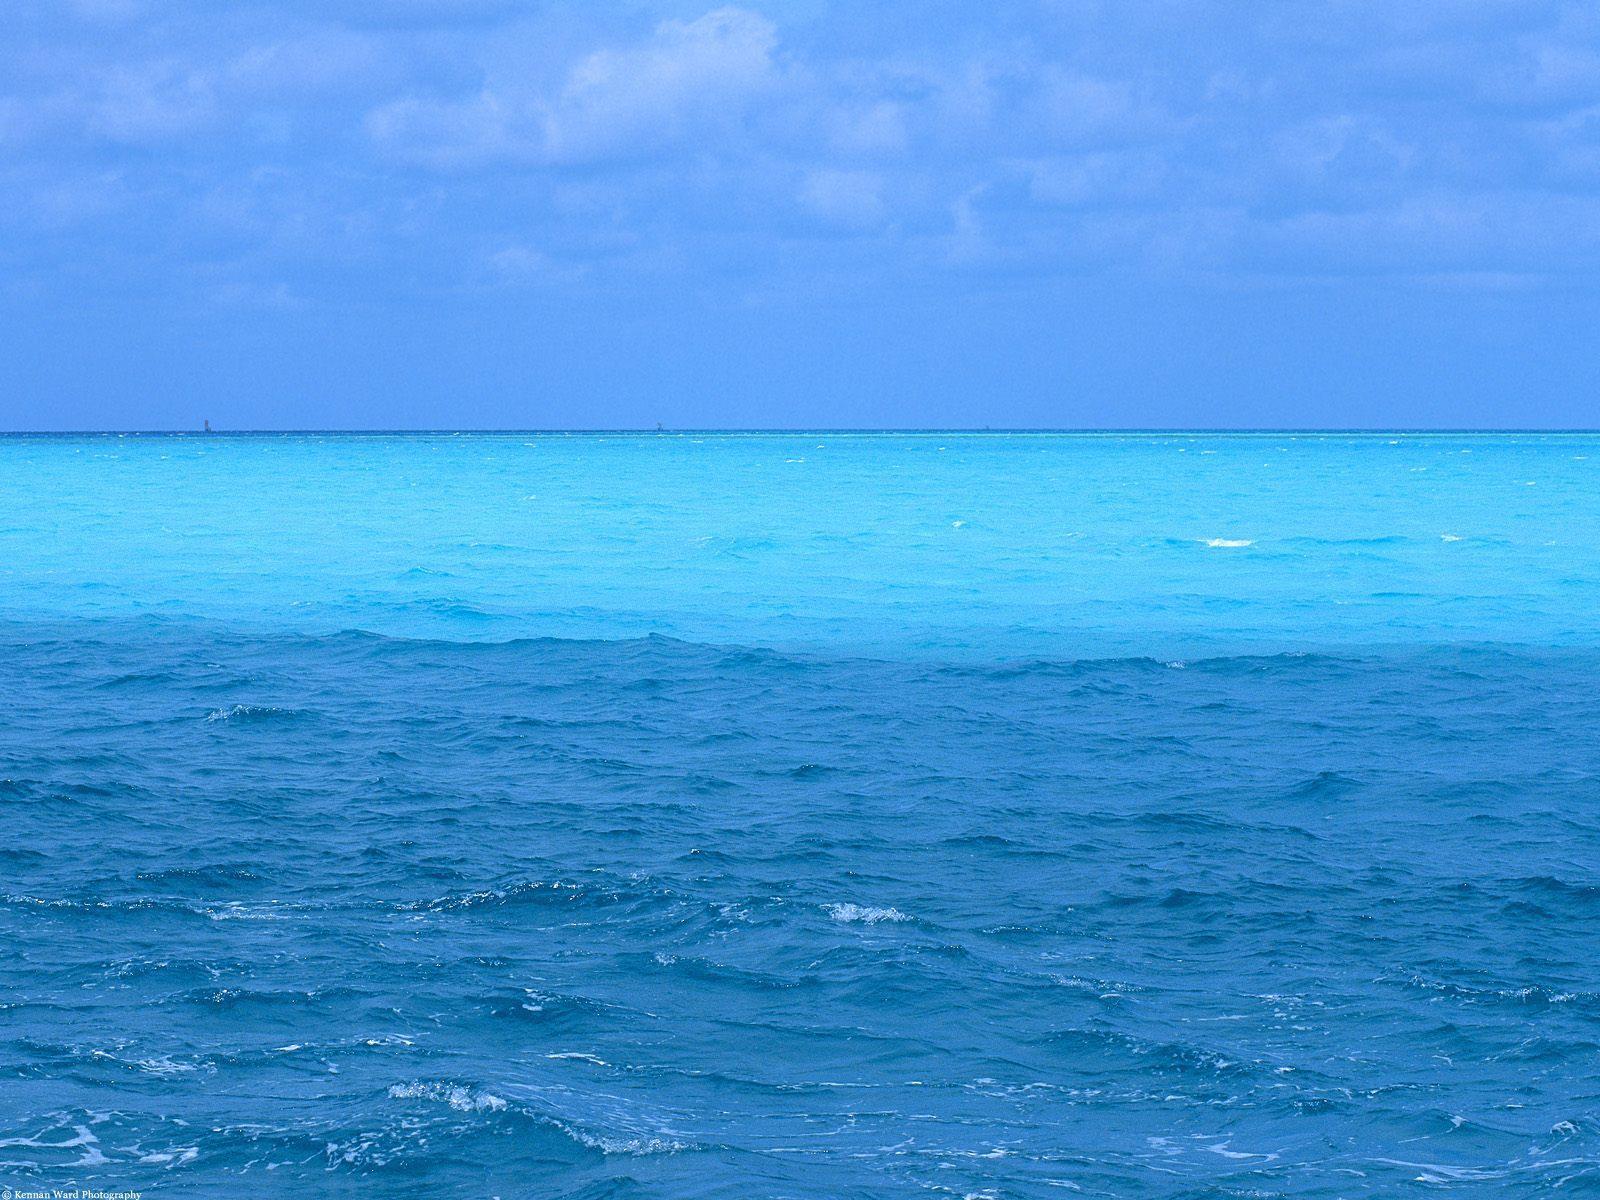 Blue Ocean Backgrounds - Wallpaper Cave